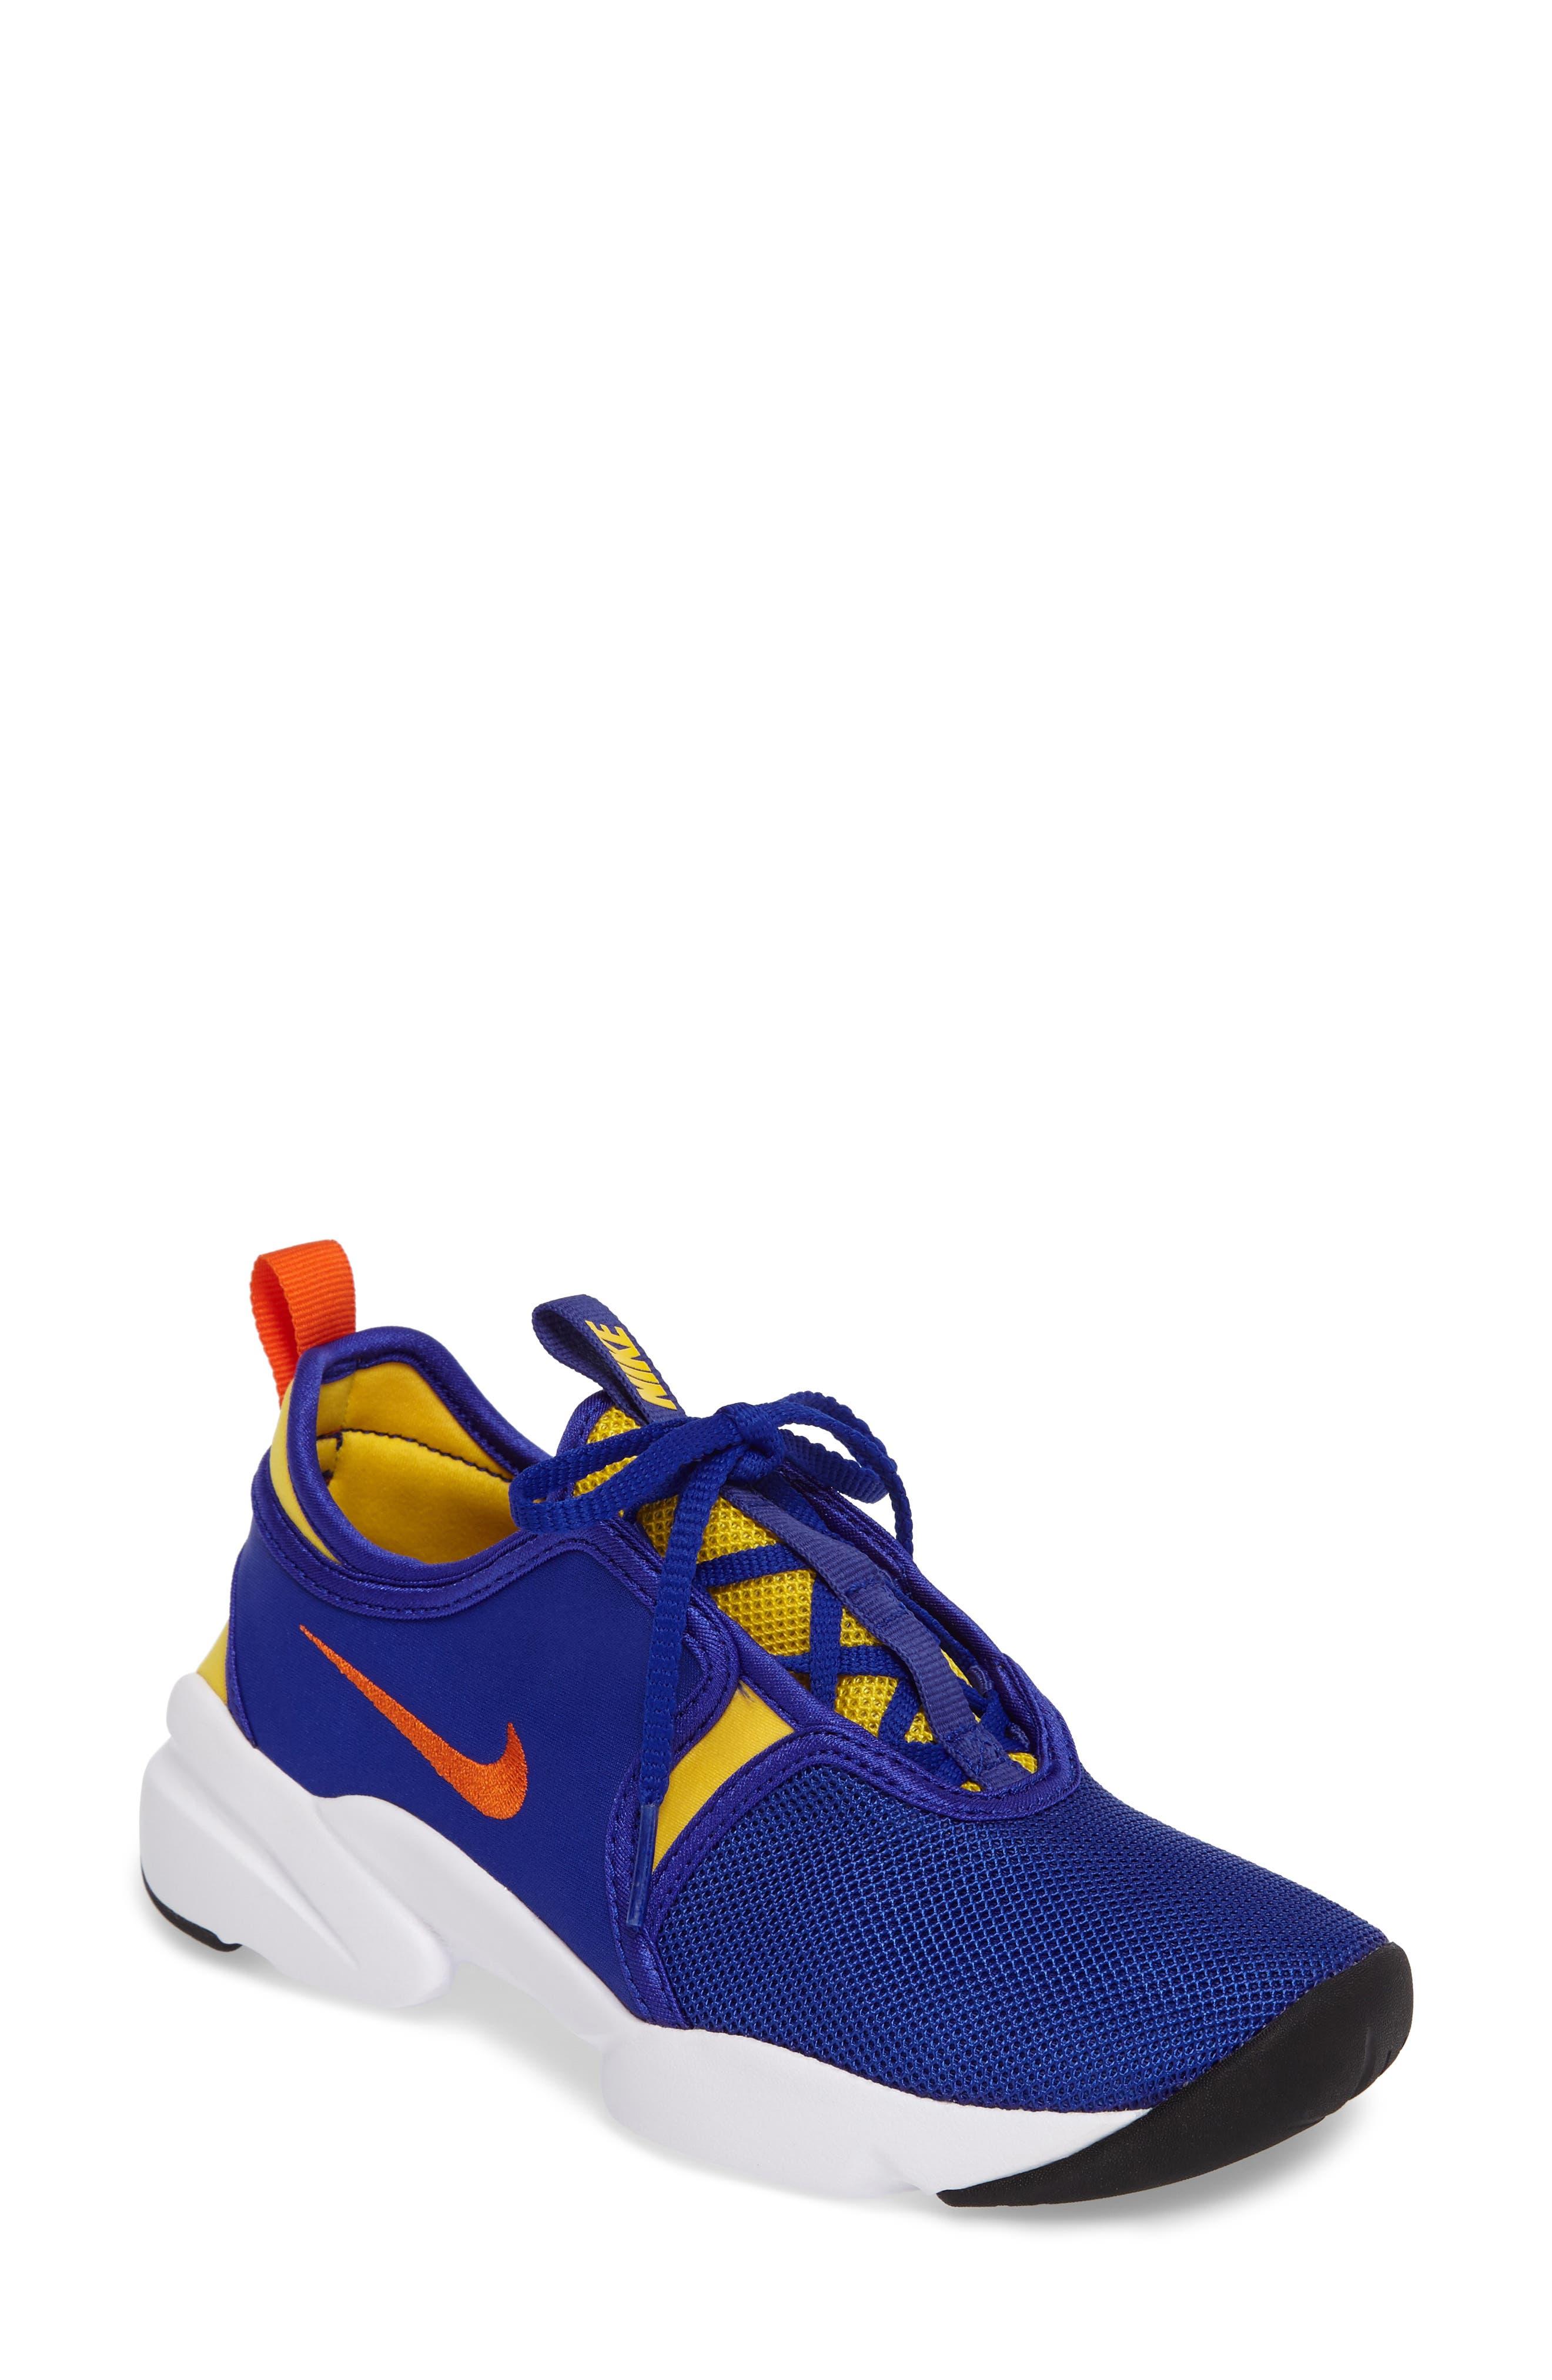 Alternate Image 1 Selected - Nike Loden Sneaker (Women)